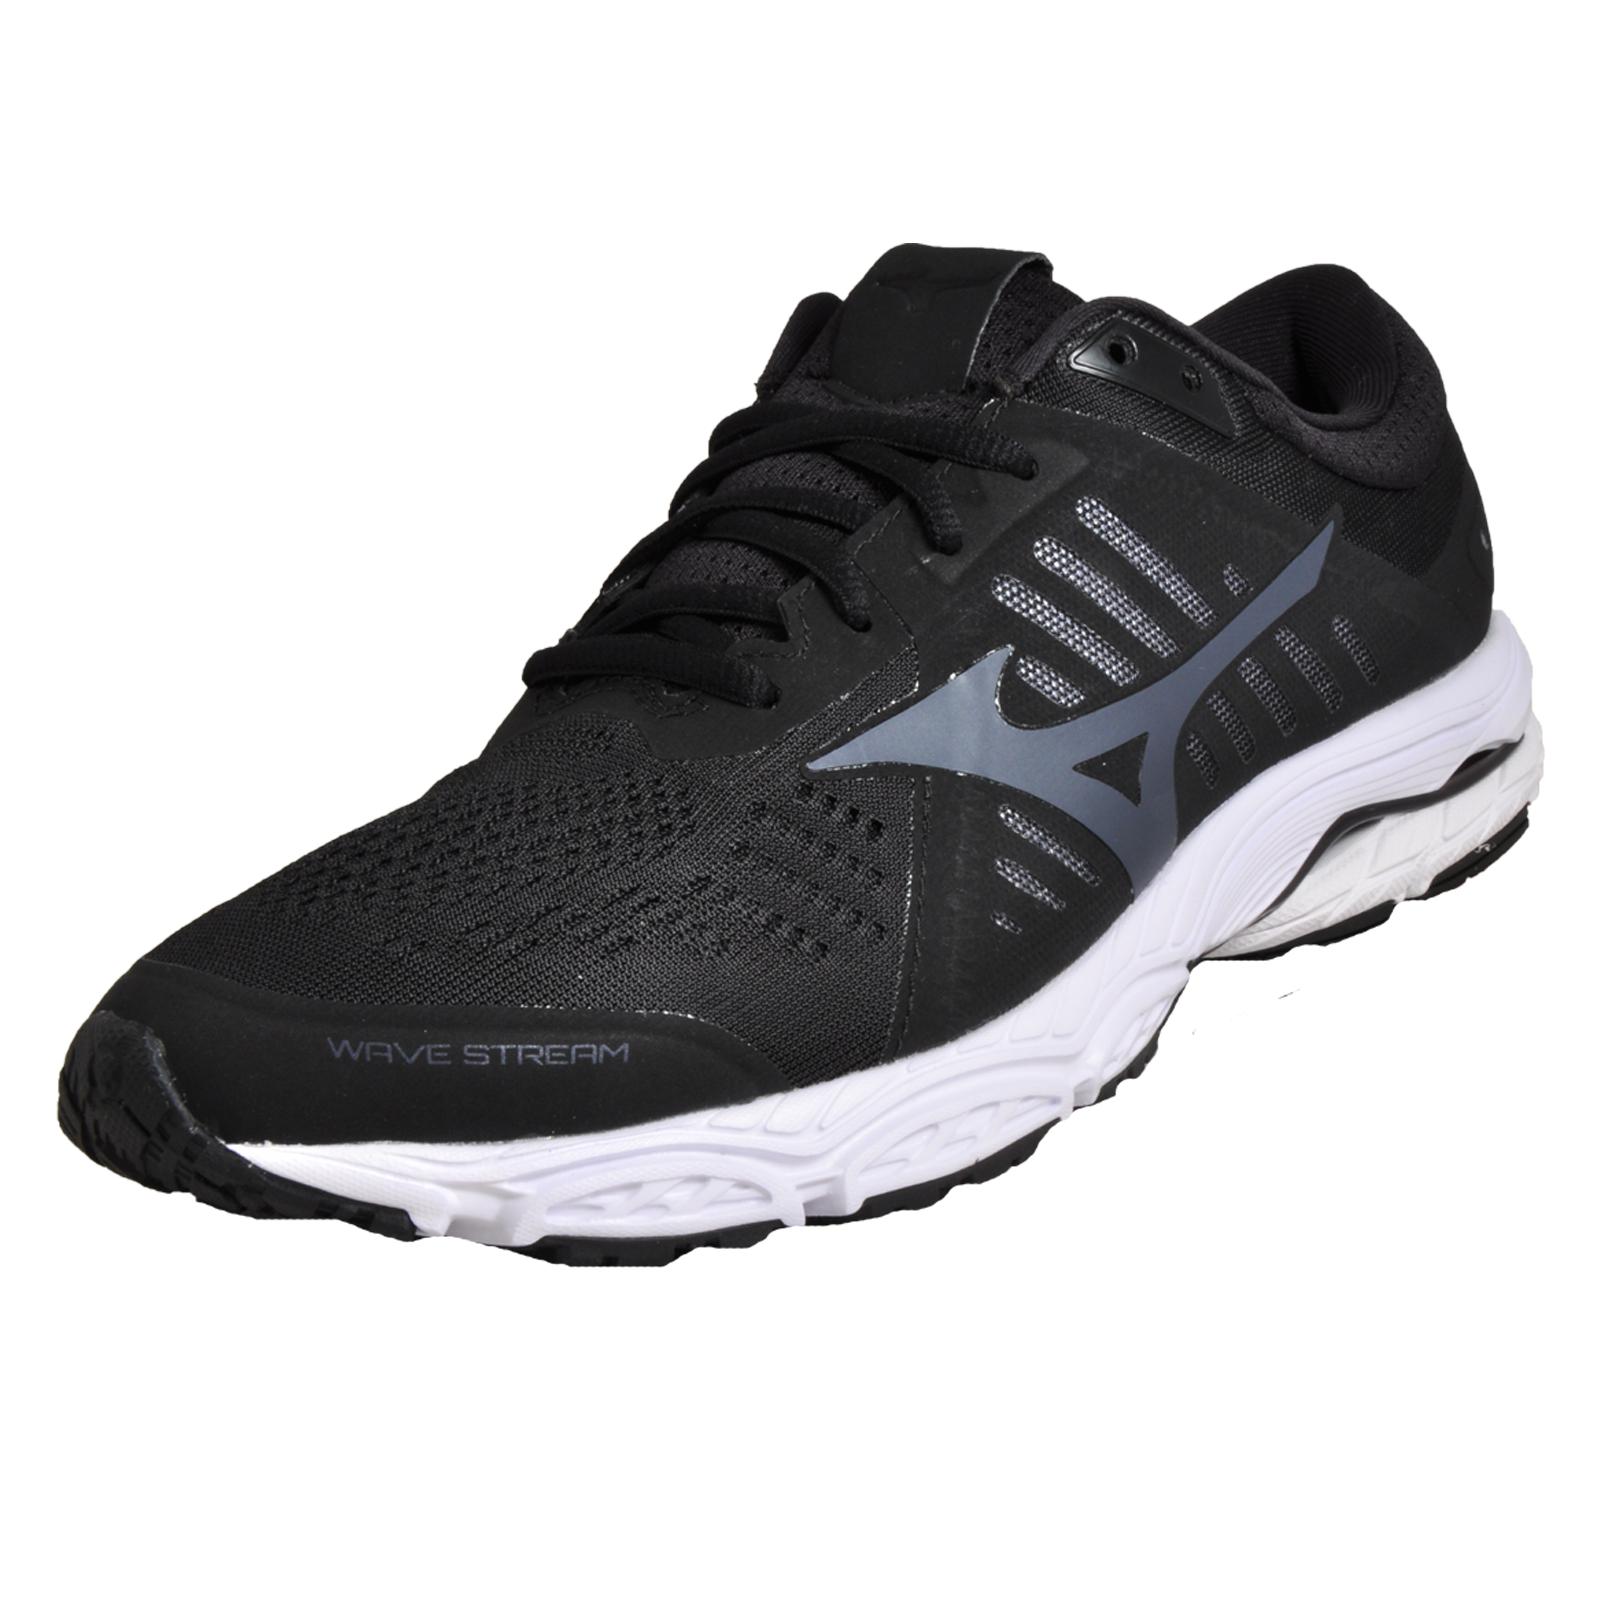 Mizuno Wave Stream Premium High-Performance Men s Running Shoes Black 357a63f949f